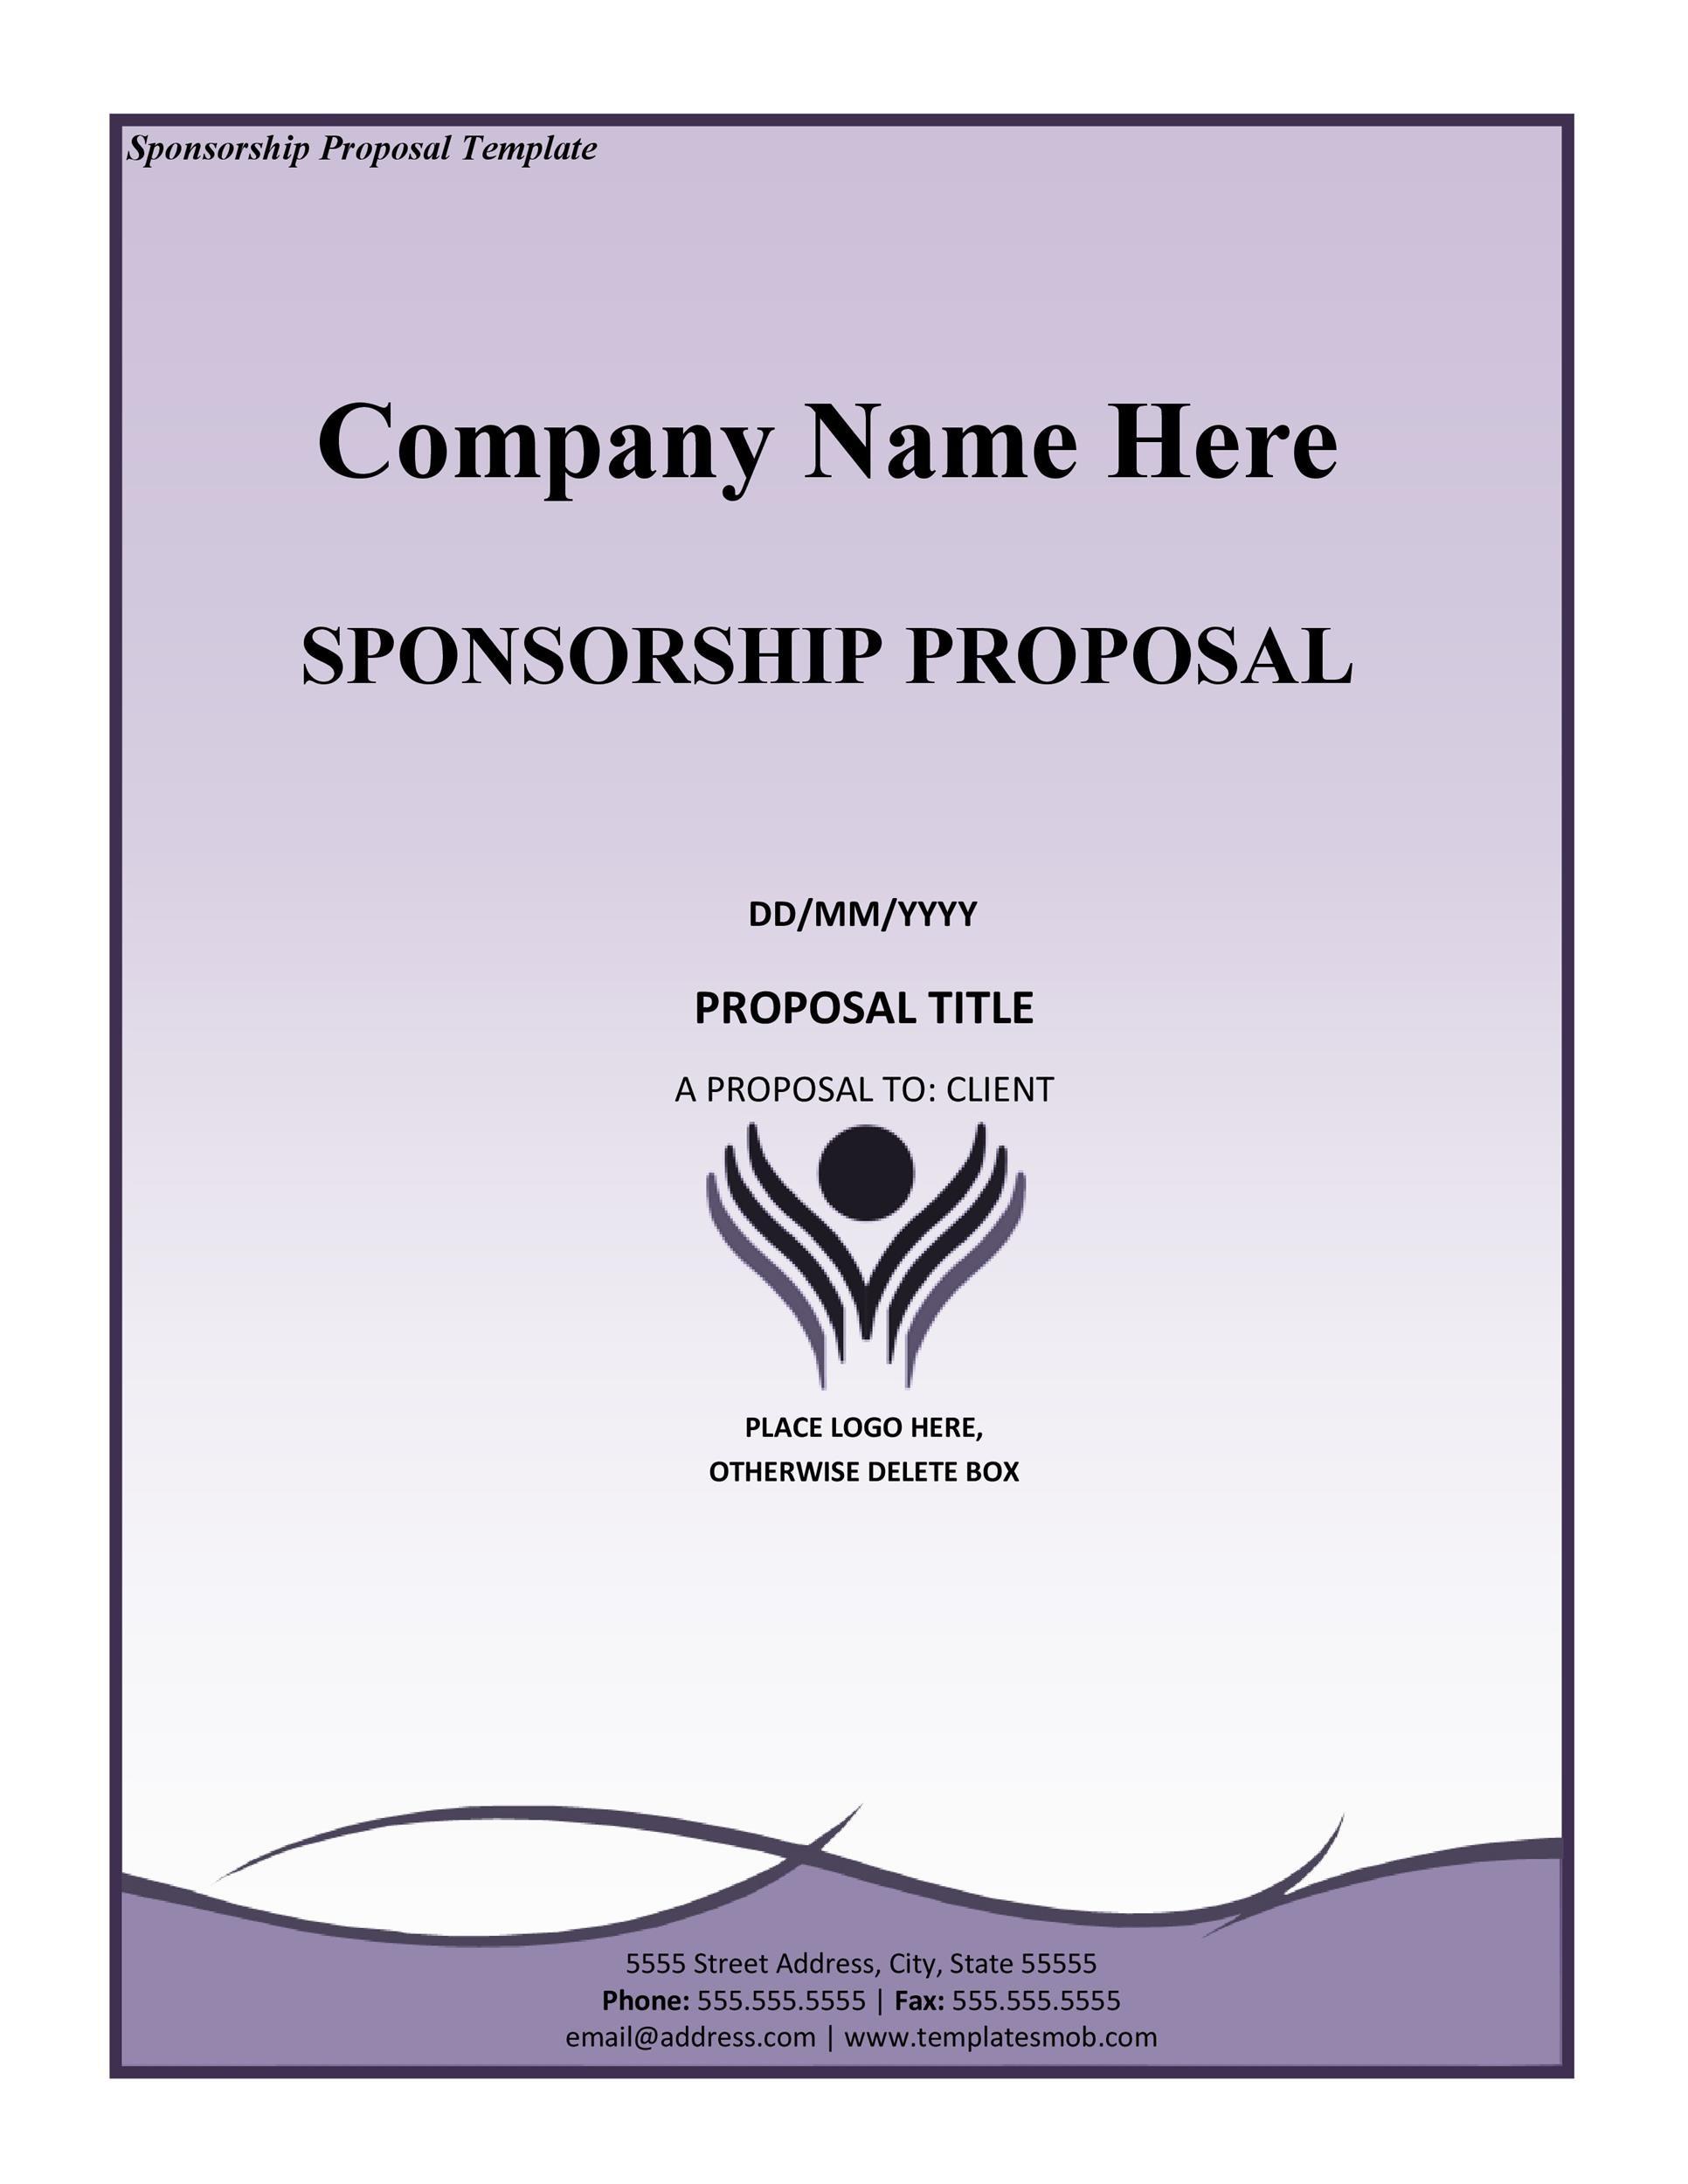 Free Sponsorship Letter Template 30